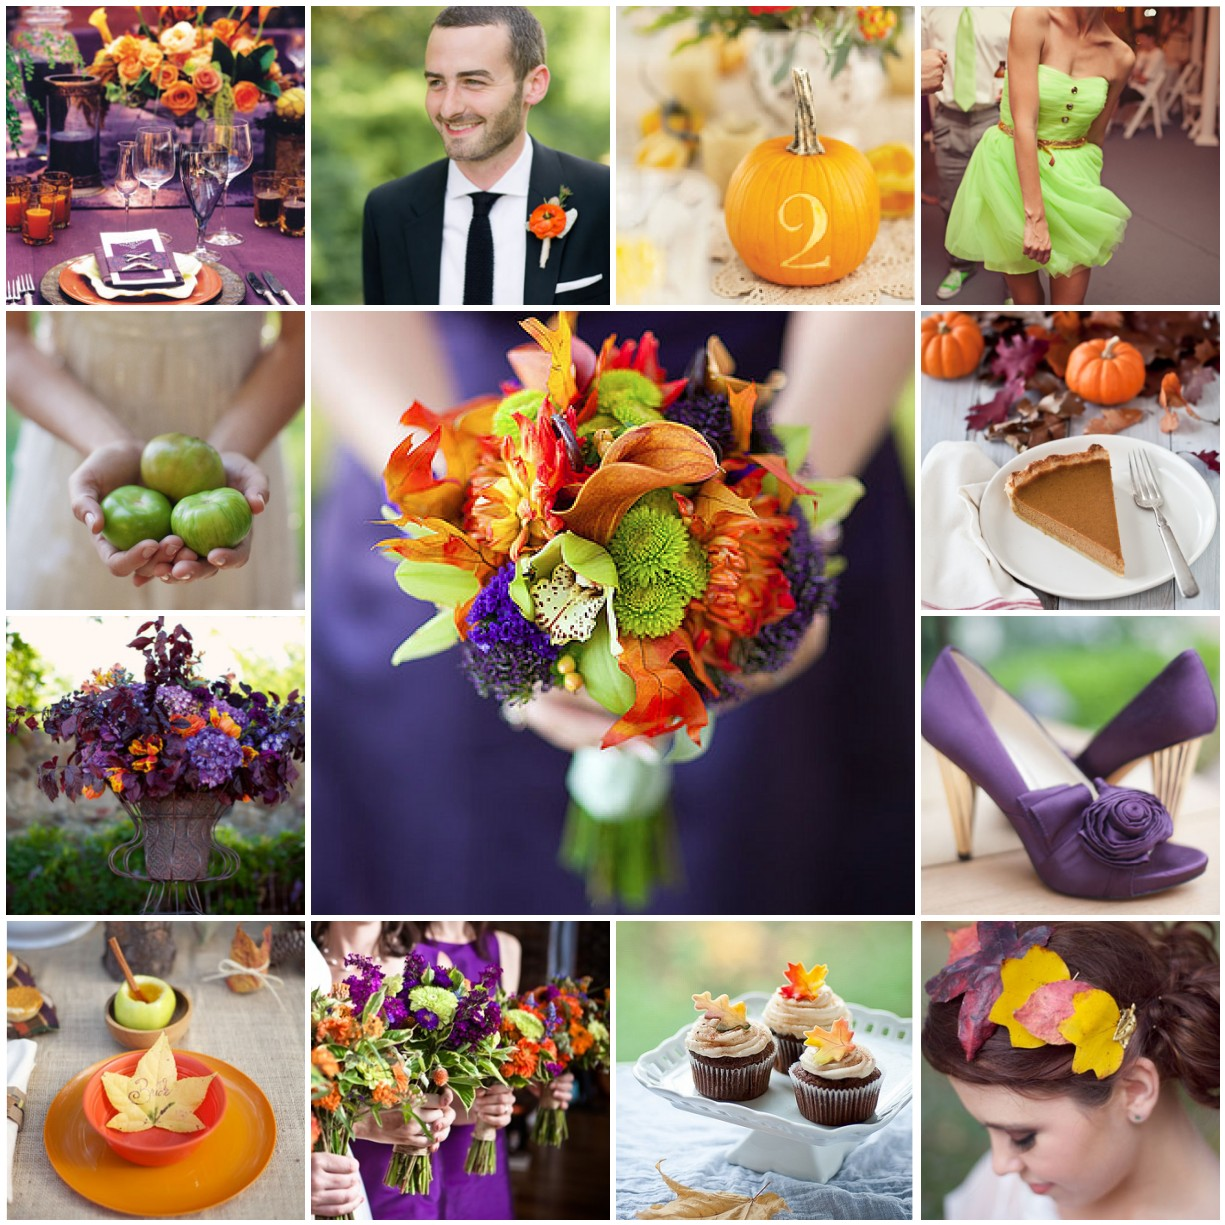 Purple And Green Wedding Ideas: Fall Orange, Plum, Green Wedding